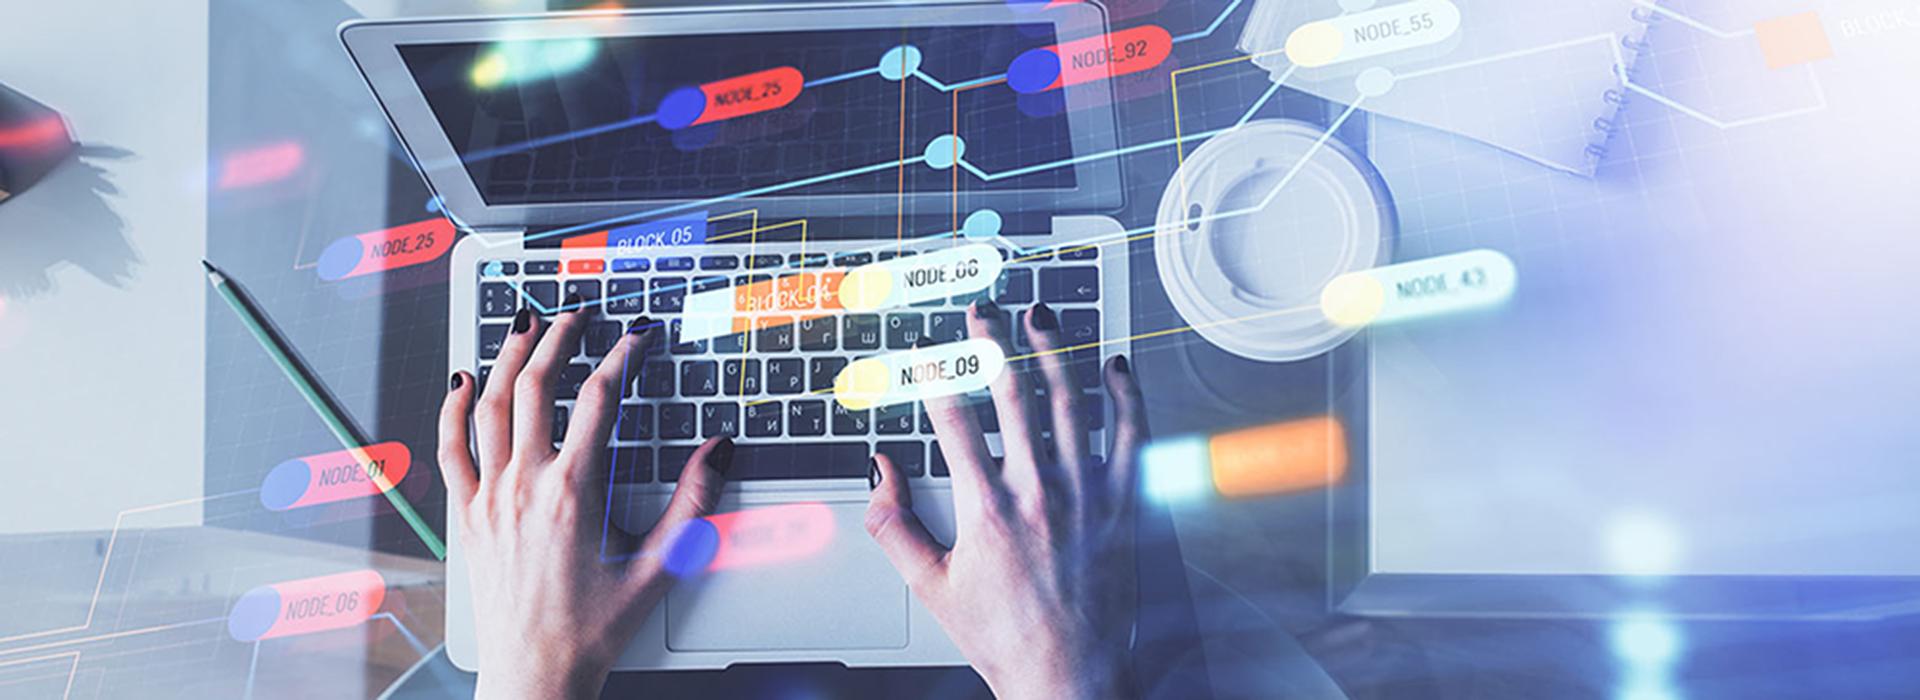 Robotics - Wichtige digitale Akteure im modernen Service Desk